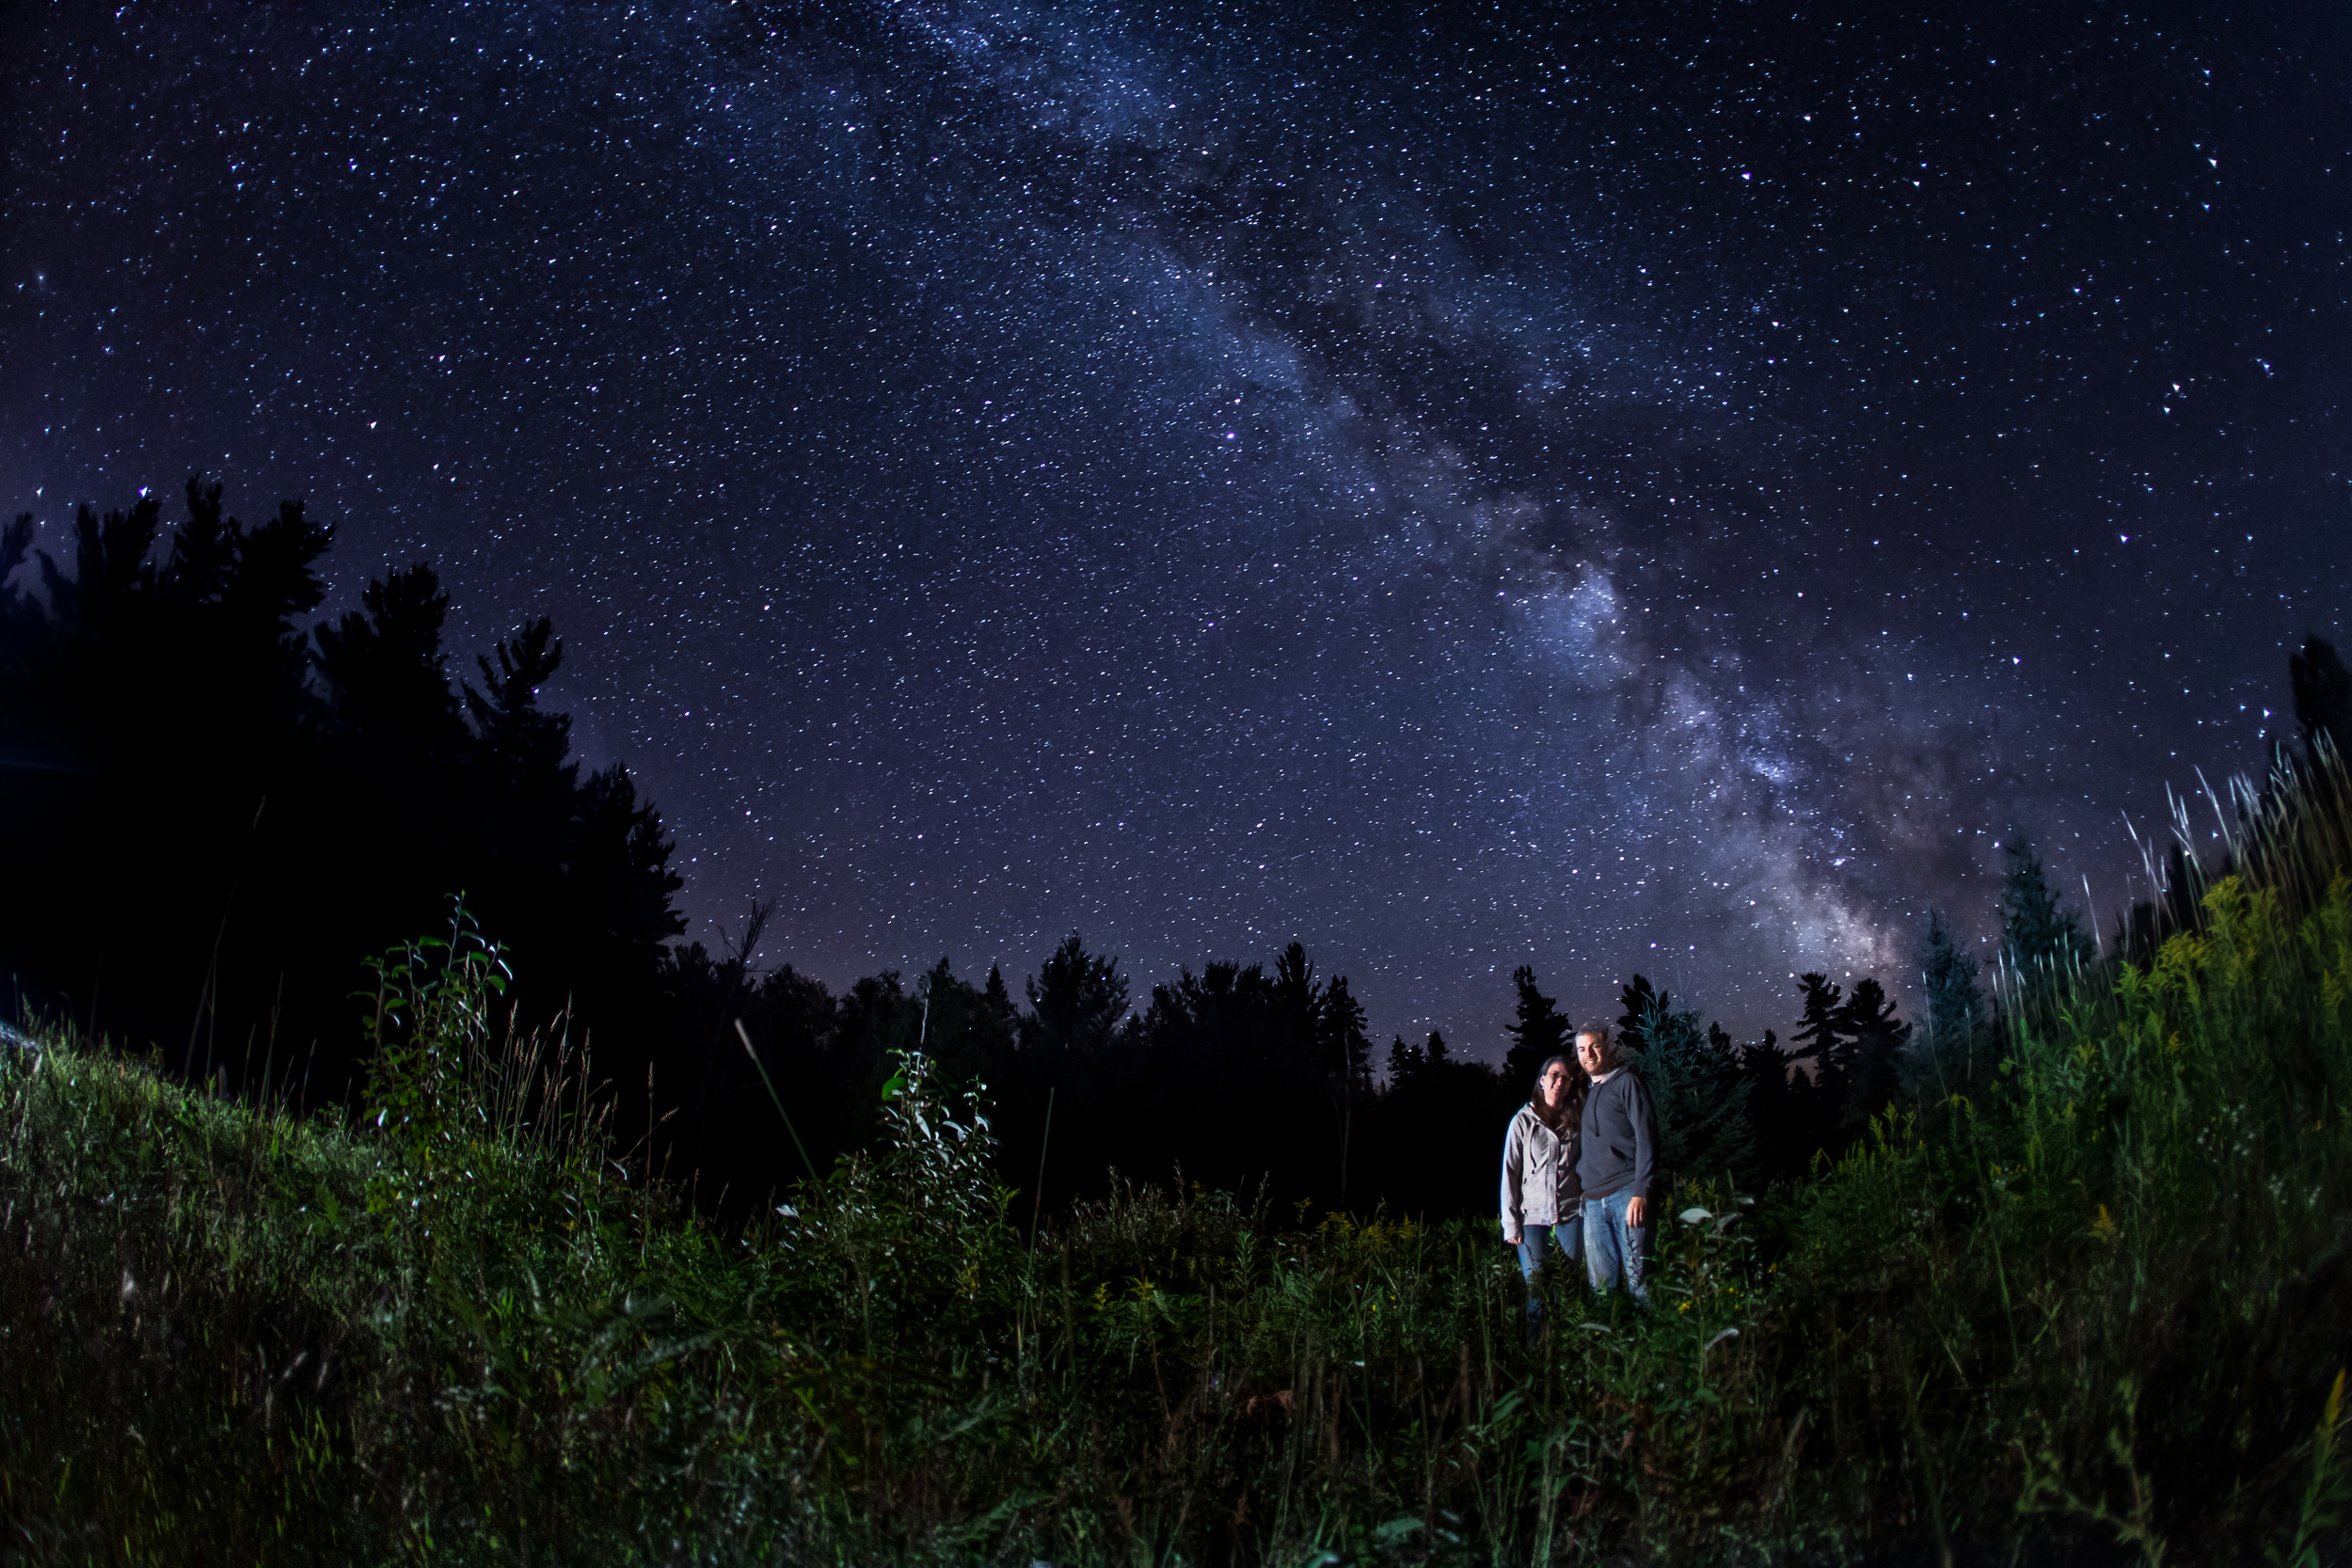 Jonathan-Kuhn-Photography-Star-sky-portrait-Wilky-Way-Ontario.JPG